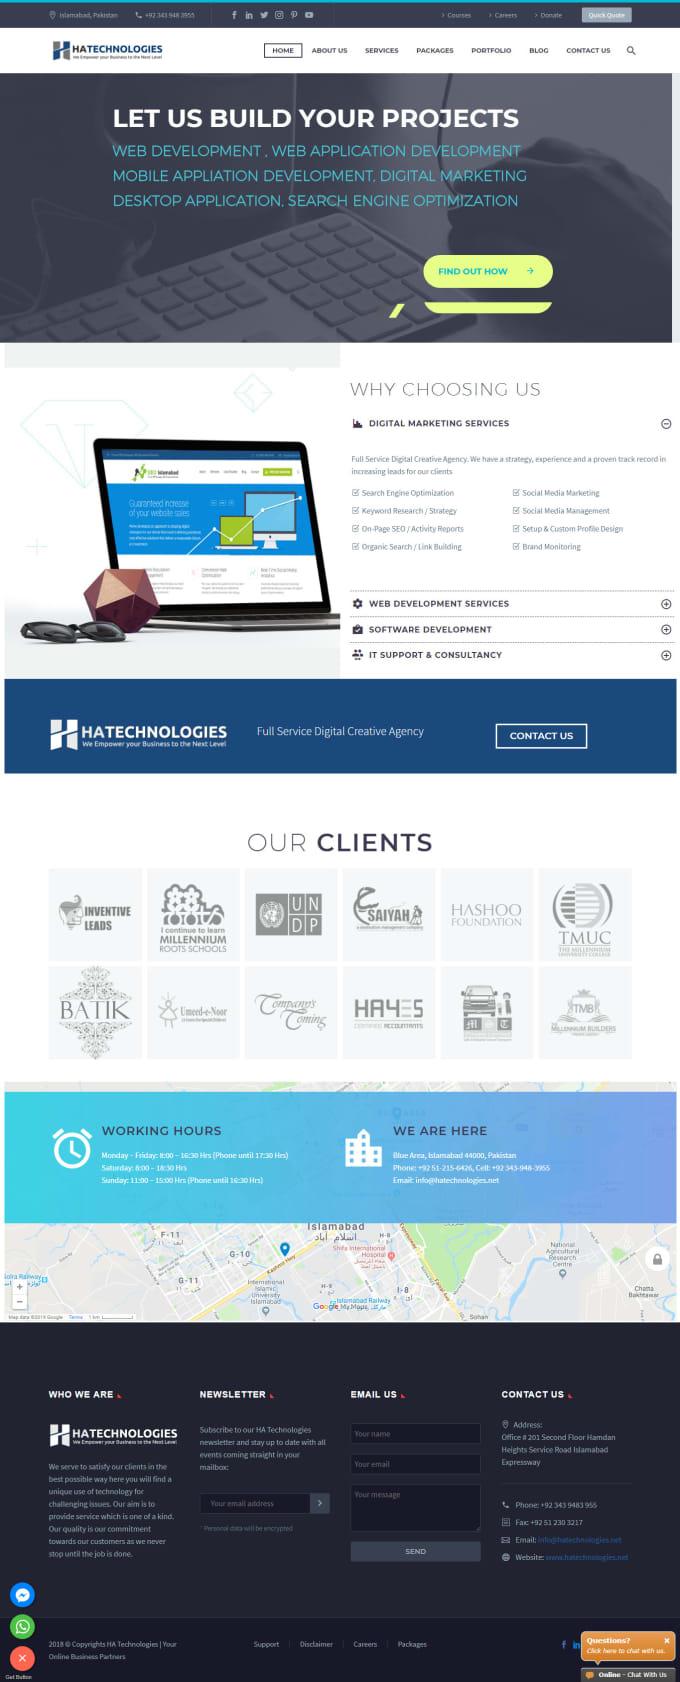 saqibtech97 : I will create wordpress website, digitall marketing, SEO and  create customize softwares for $300 on www fiverr com